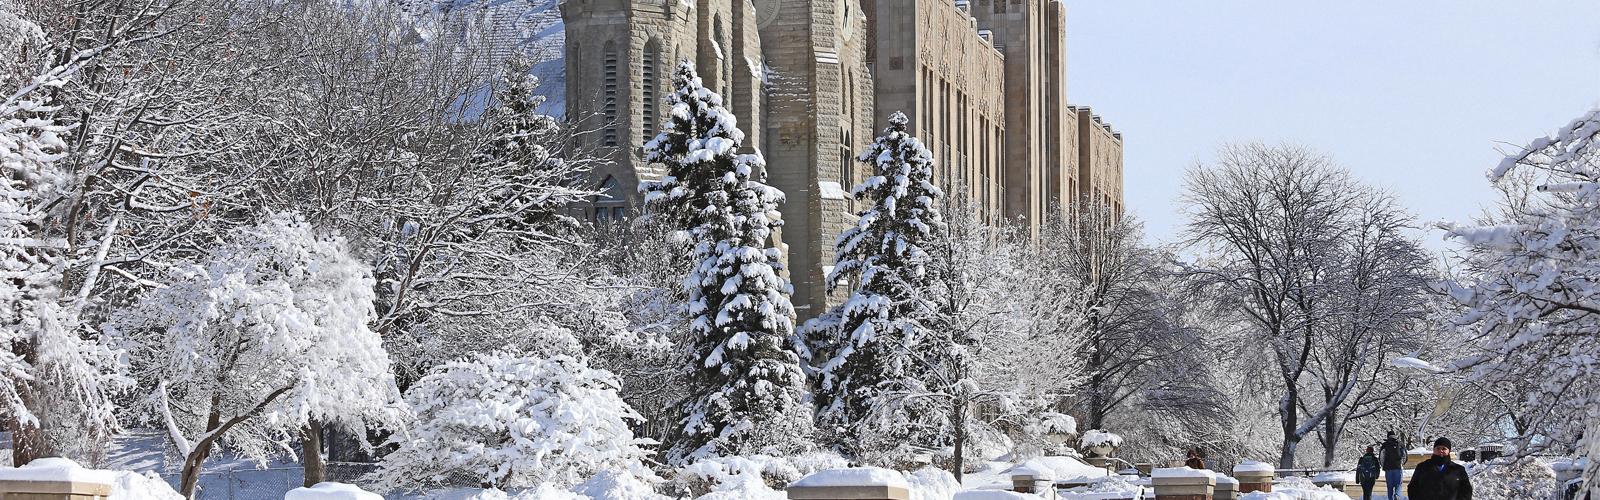 Winter at Creighton University